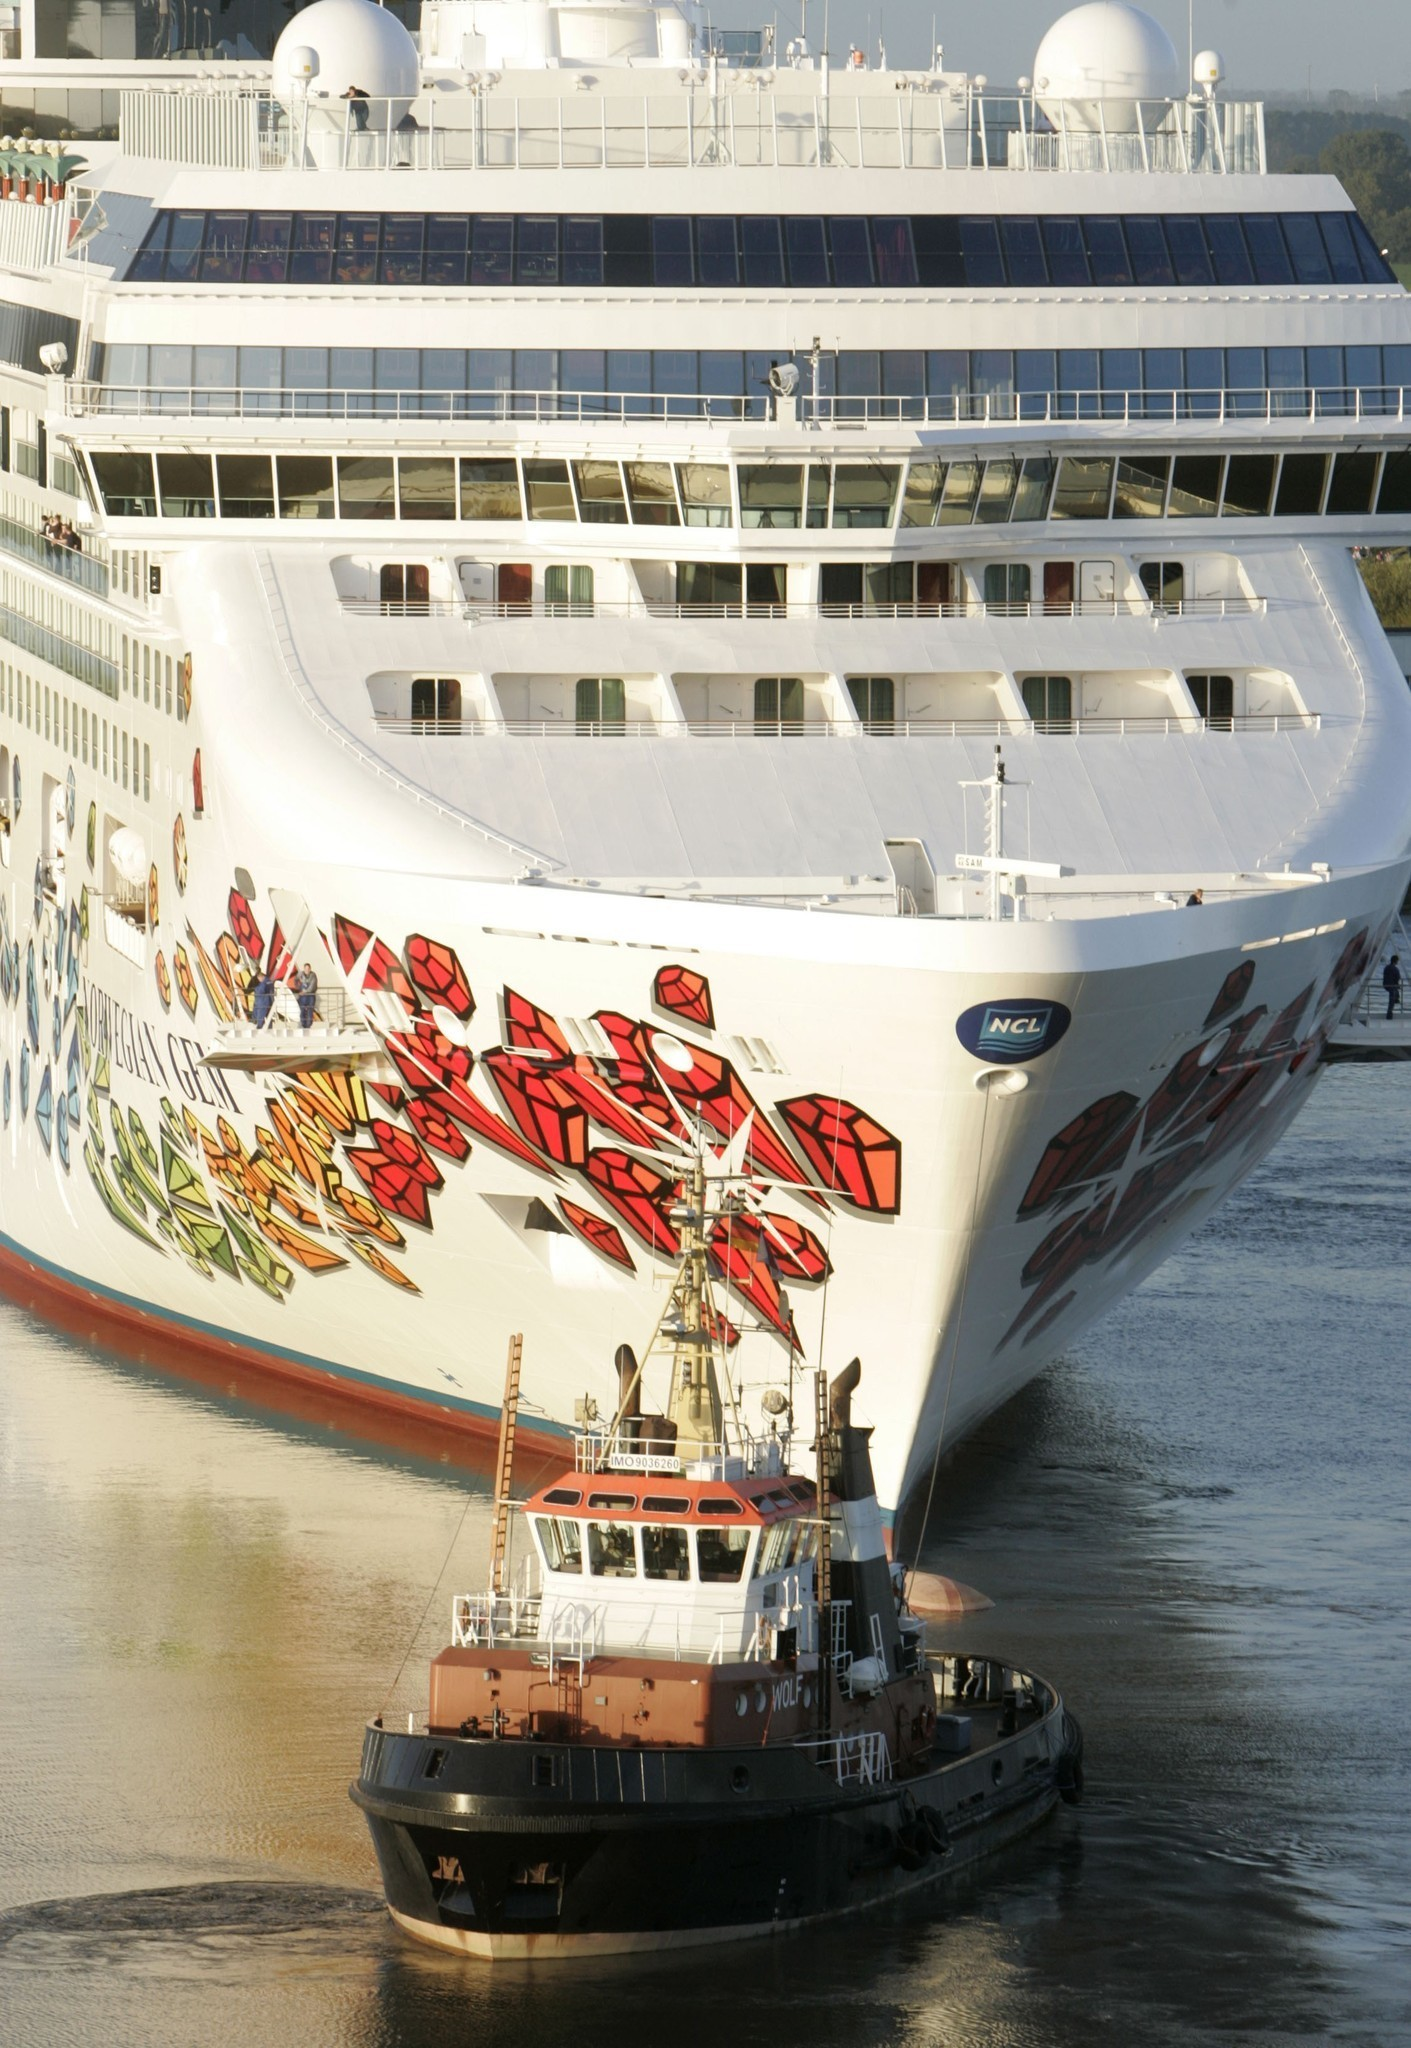 Yearold Girl Drowns In Pool Aboard Cruise Ship Orlando Sentinel - Cruise ship drowning